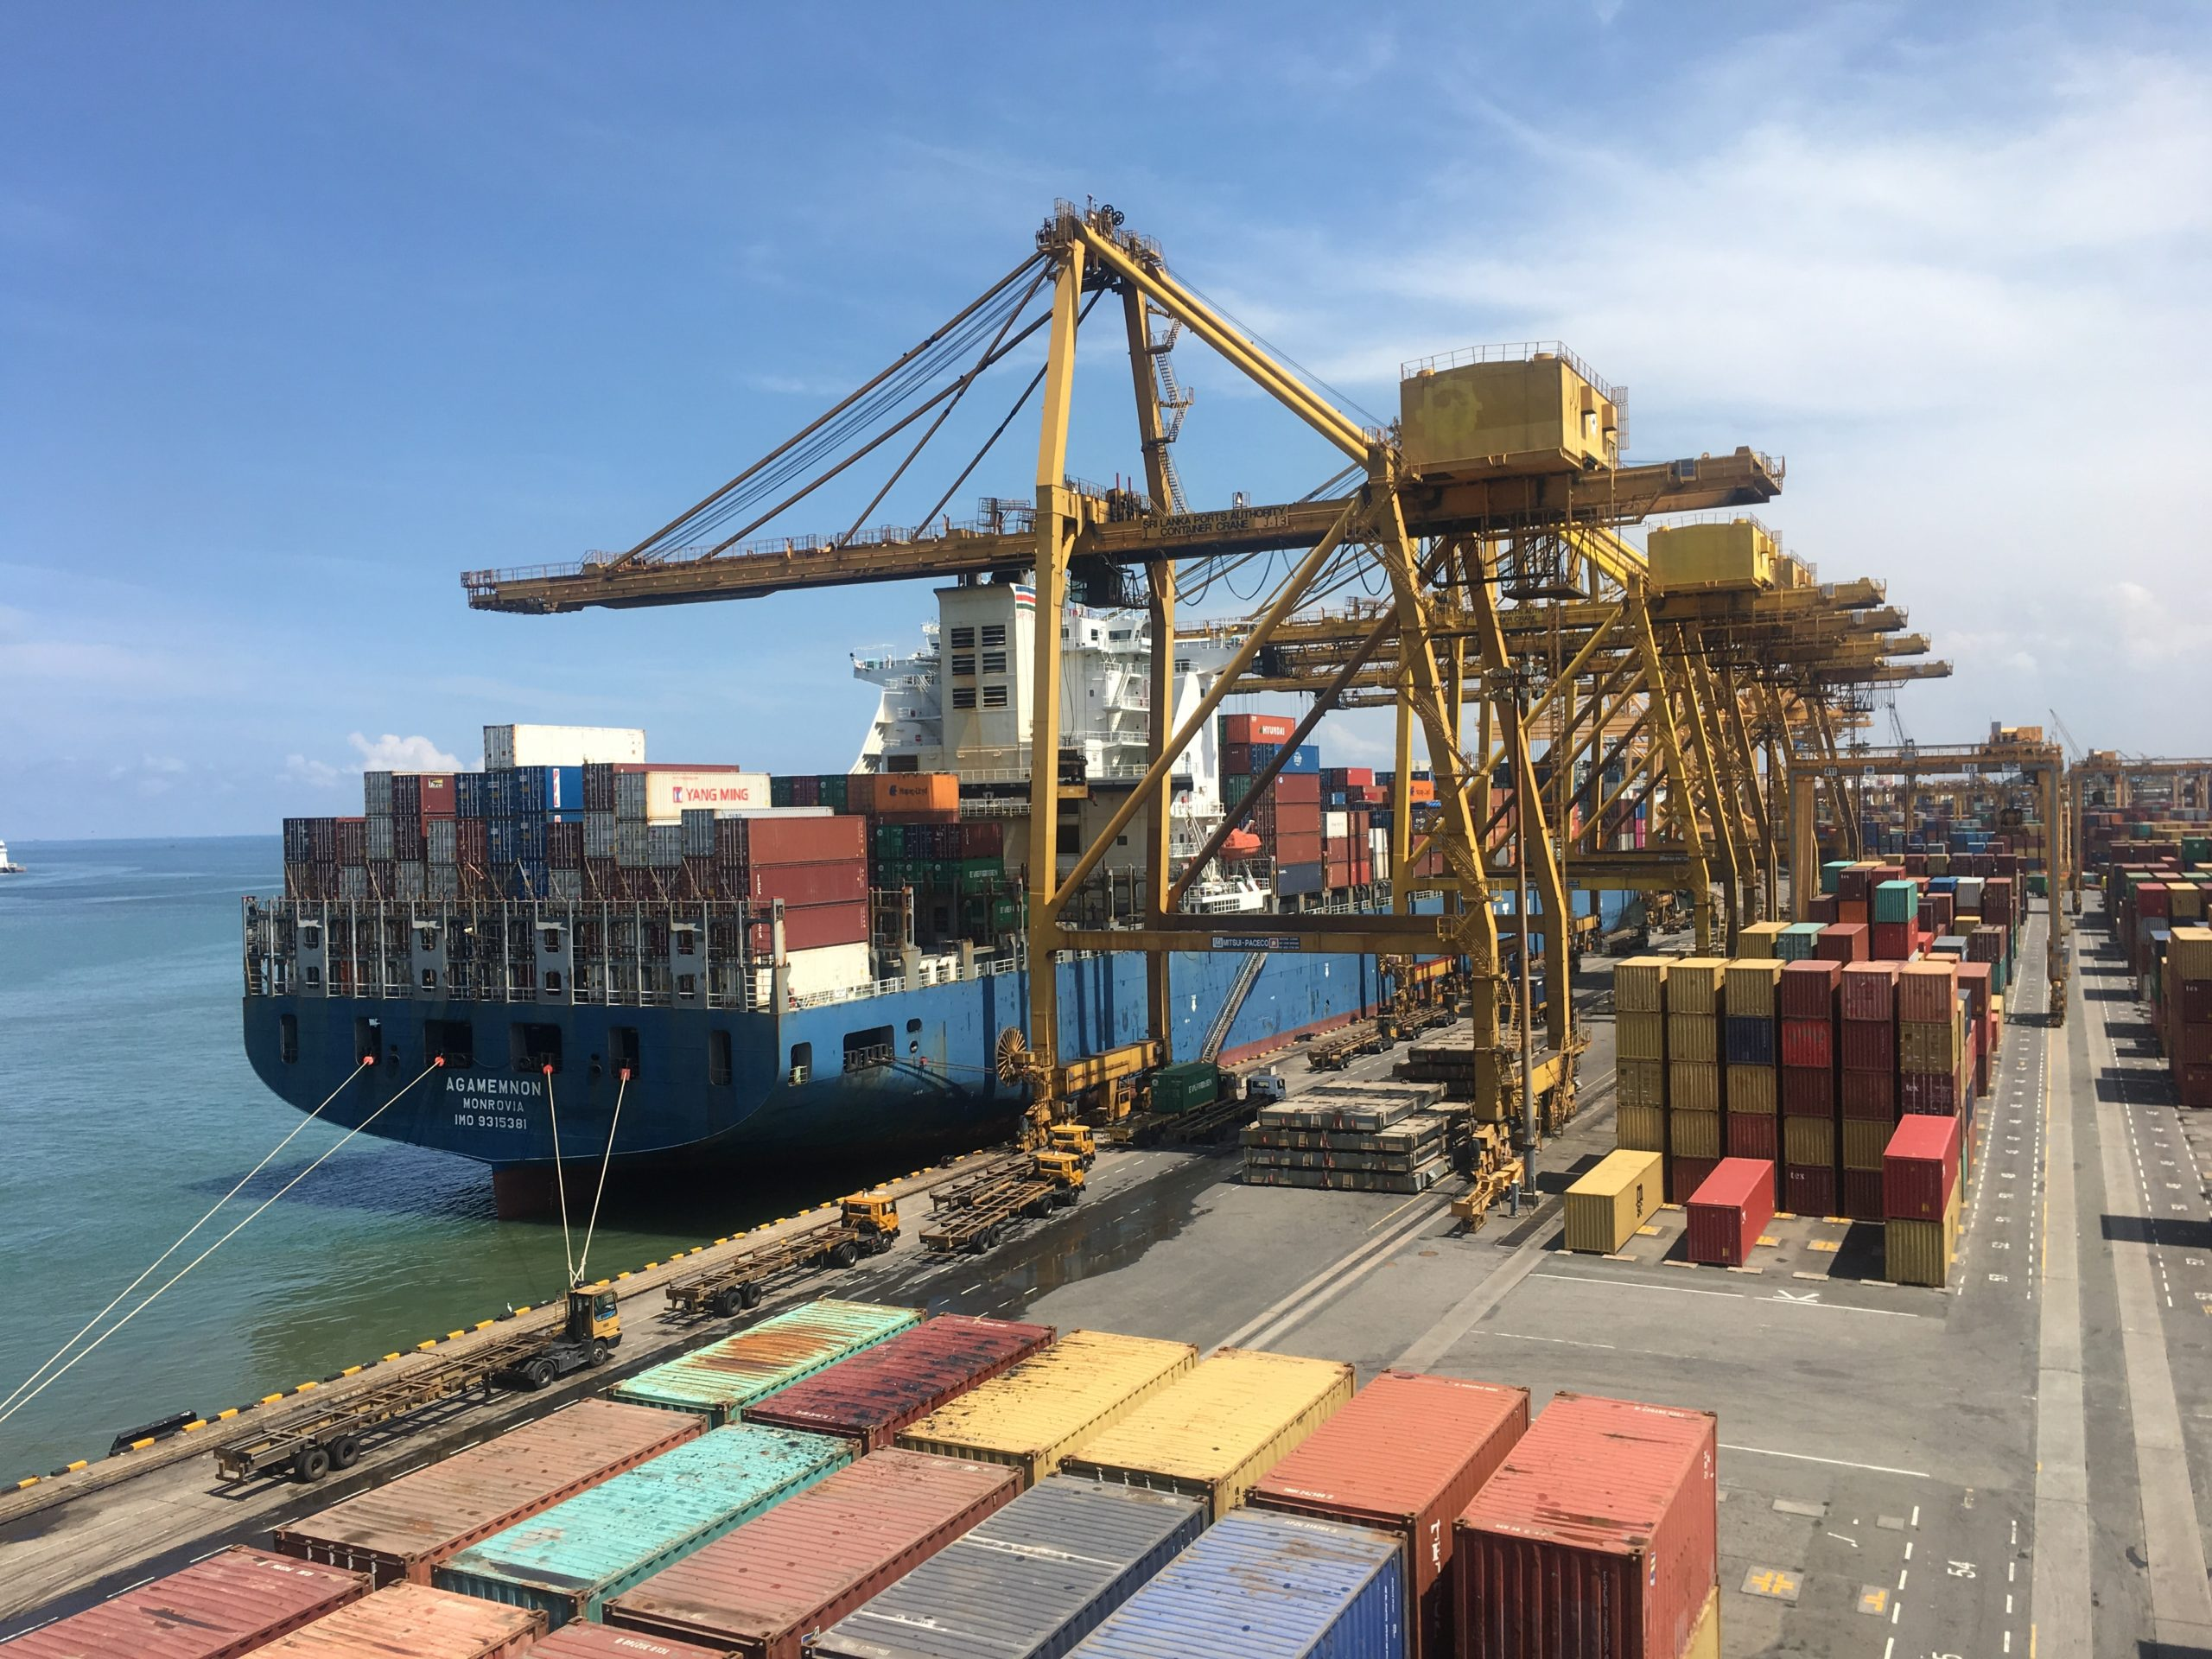 chanceller-logistica-terminal-alfandegário-porto-cargas-conteiner-importacao-exportacao-comercio-exterior